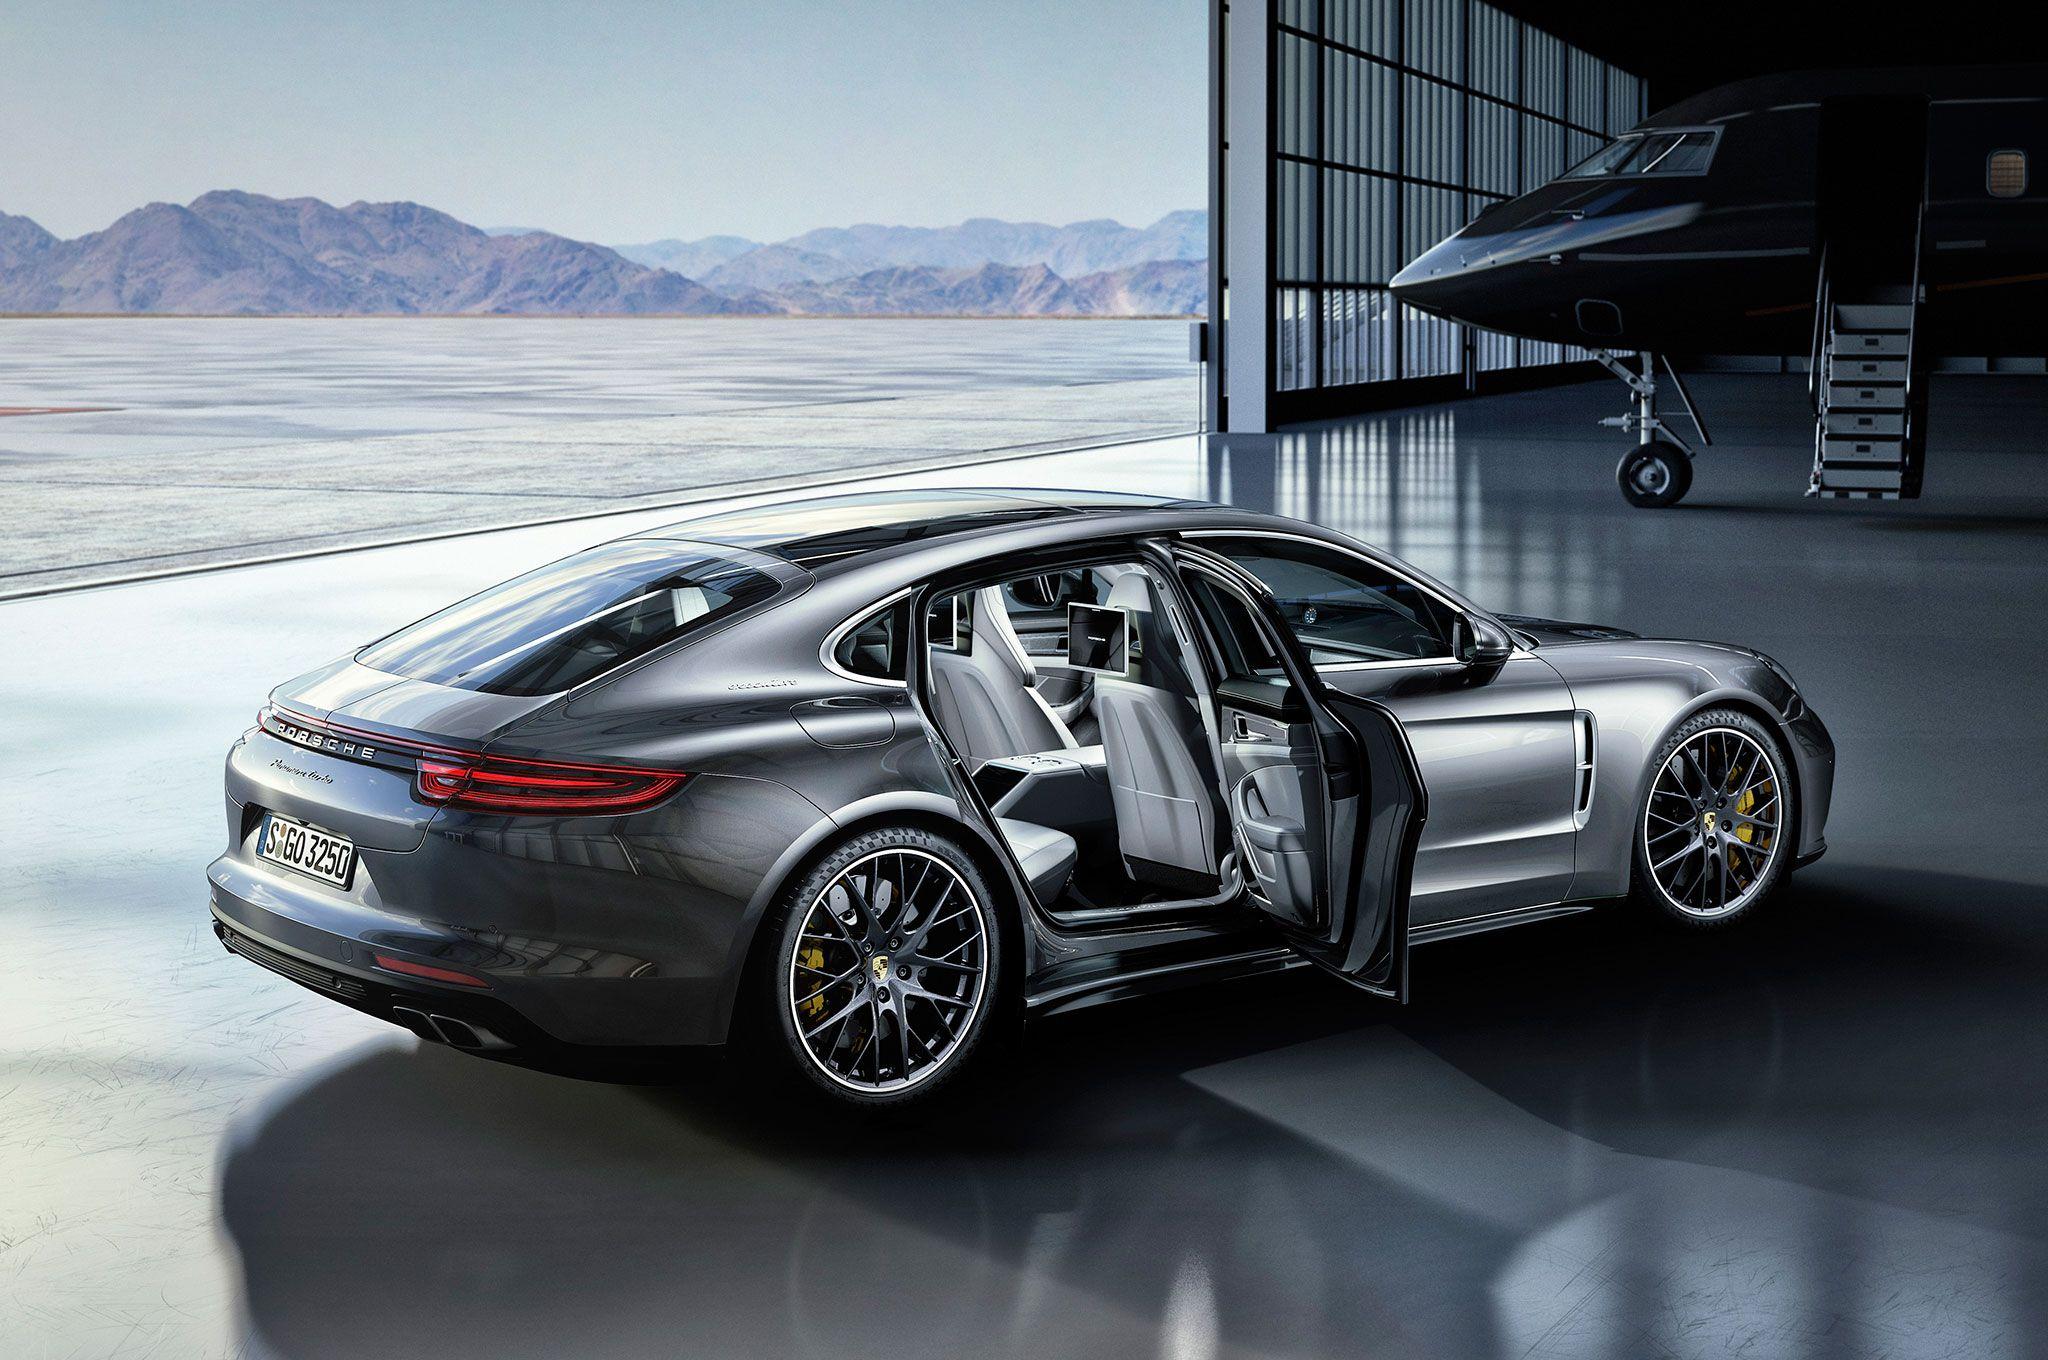 2017 Porsche Panamera Turbo Executive 2048x1360 Wallpaper Background For Ipad Mini Air 2 Pro Laptop Dquocbuu